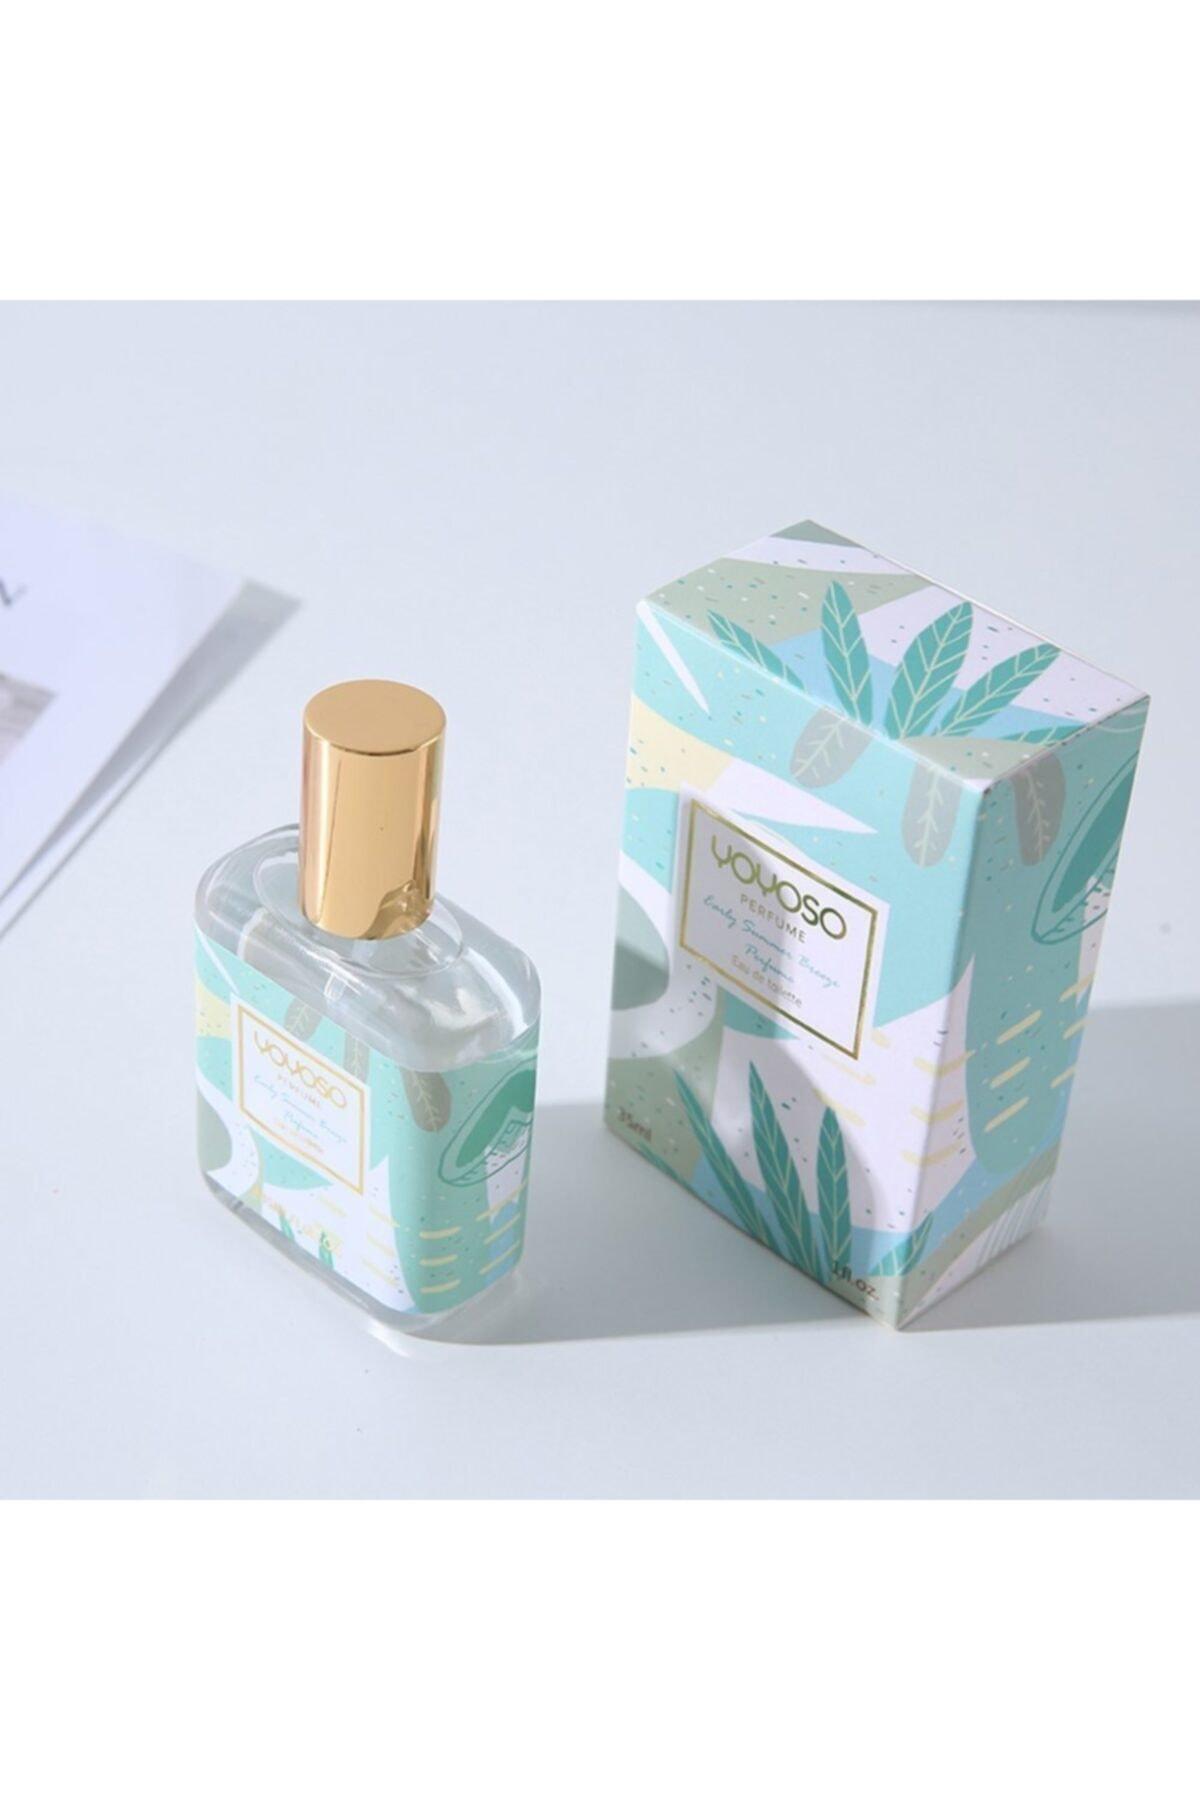 YOYOSO Early Summer Kadın Parfüm 20 ml 1